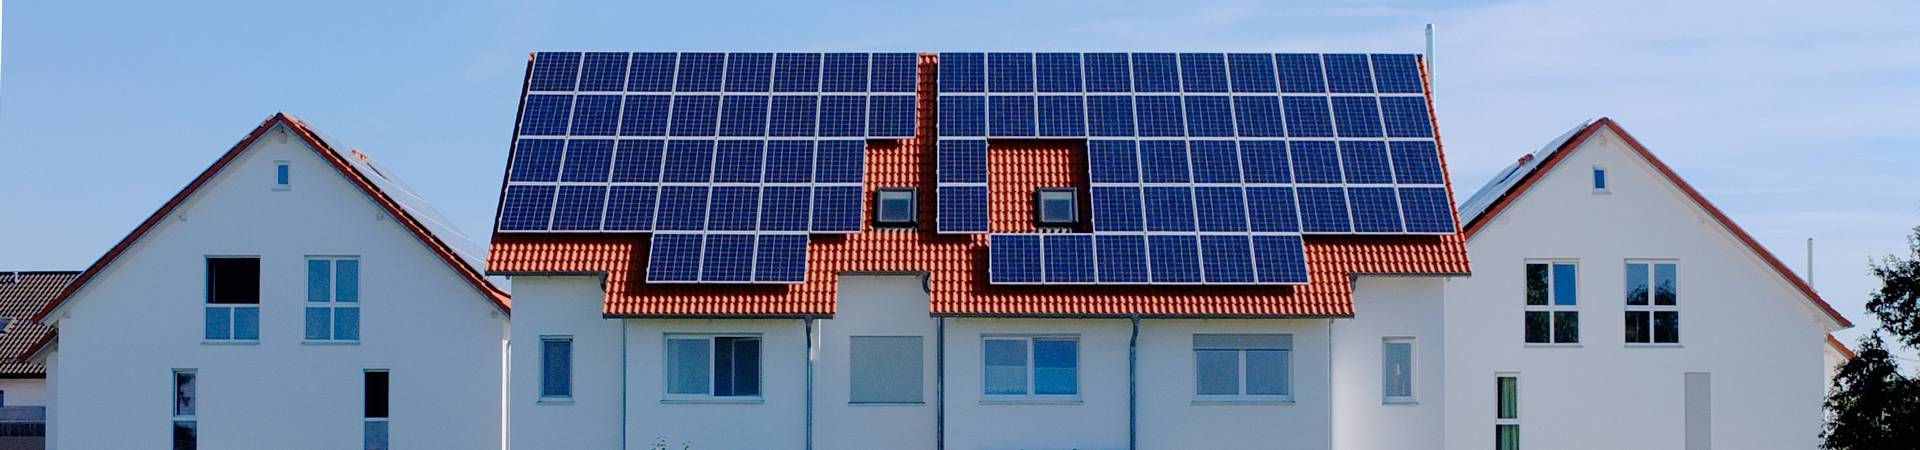 photovoltaik limburg